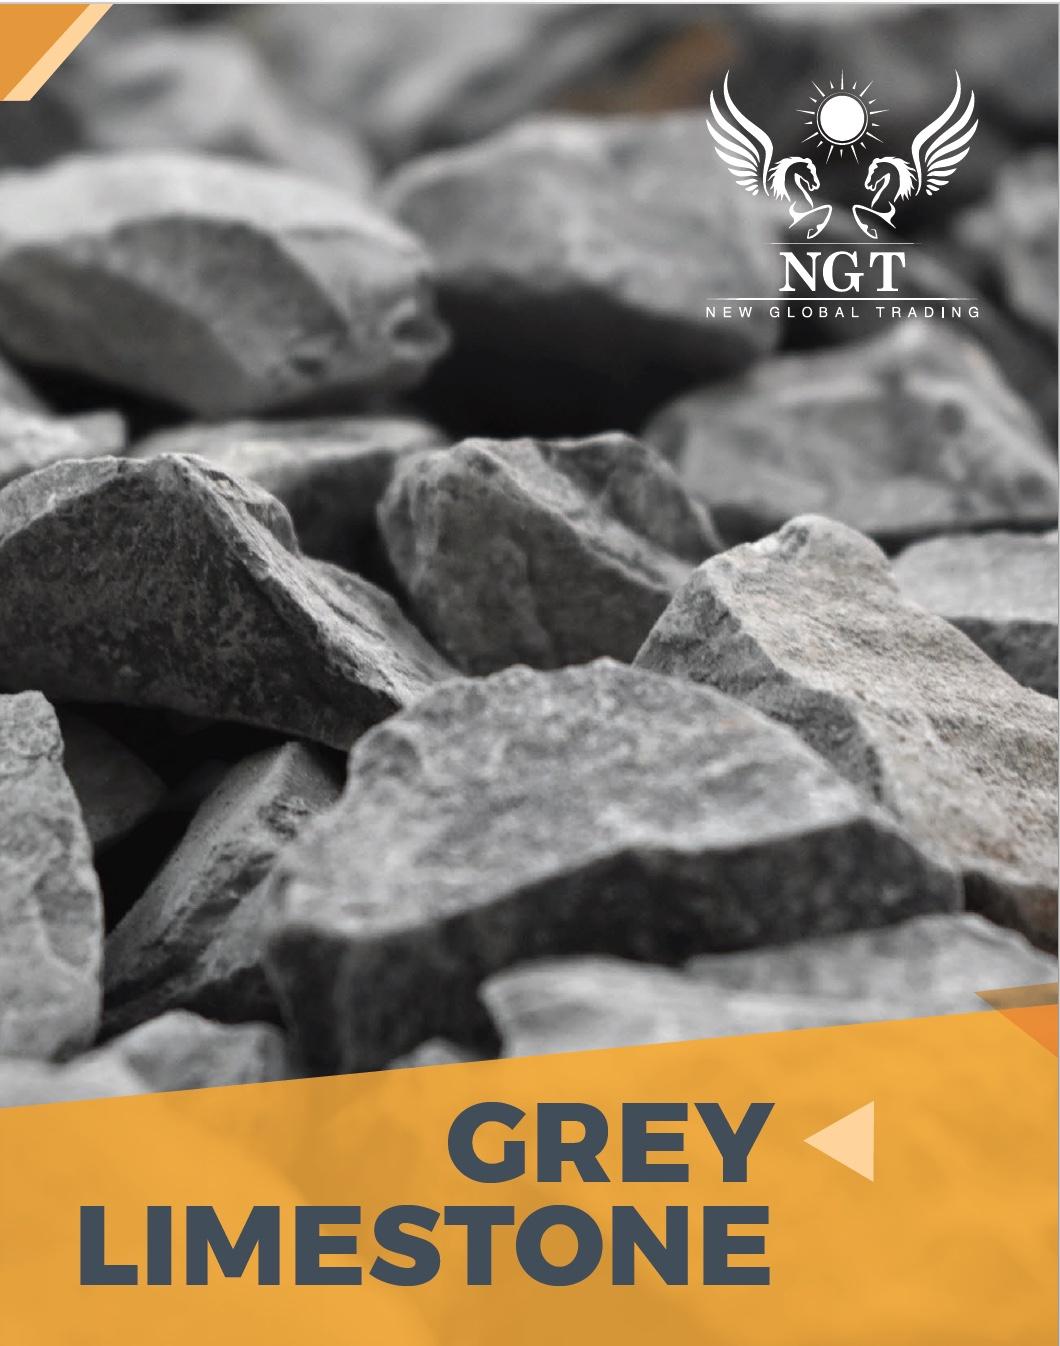 Downloads for Grey Limestone